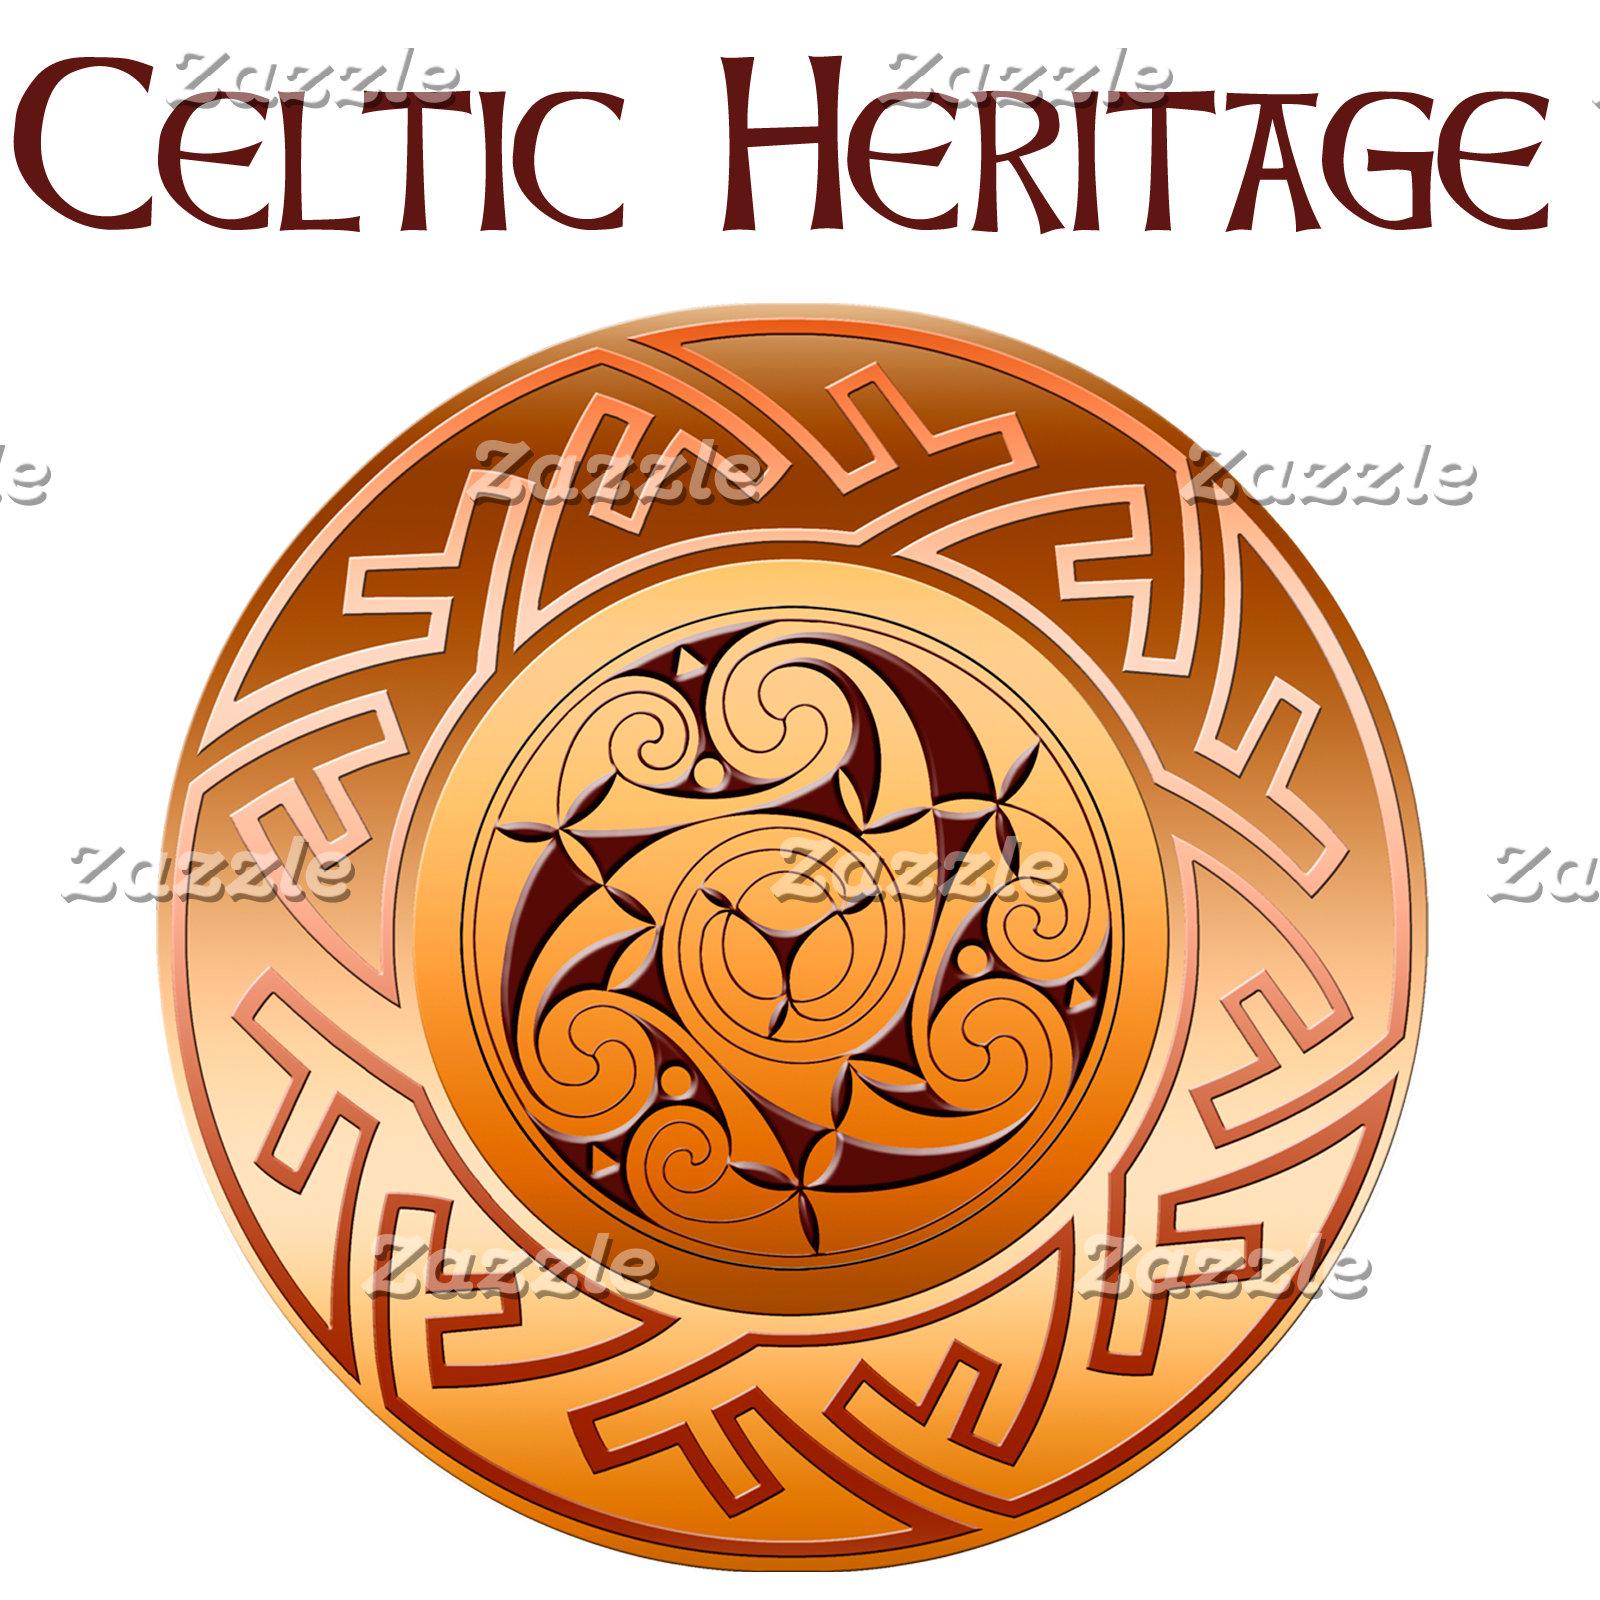 Celtic Heritage